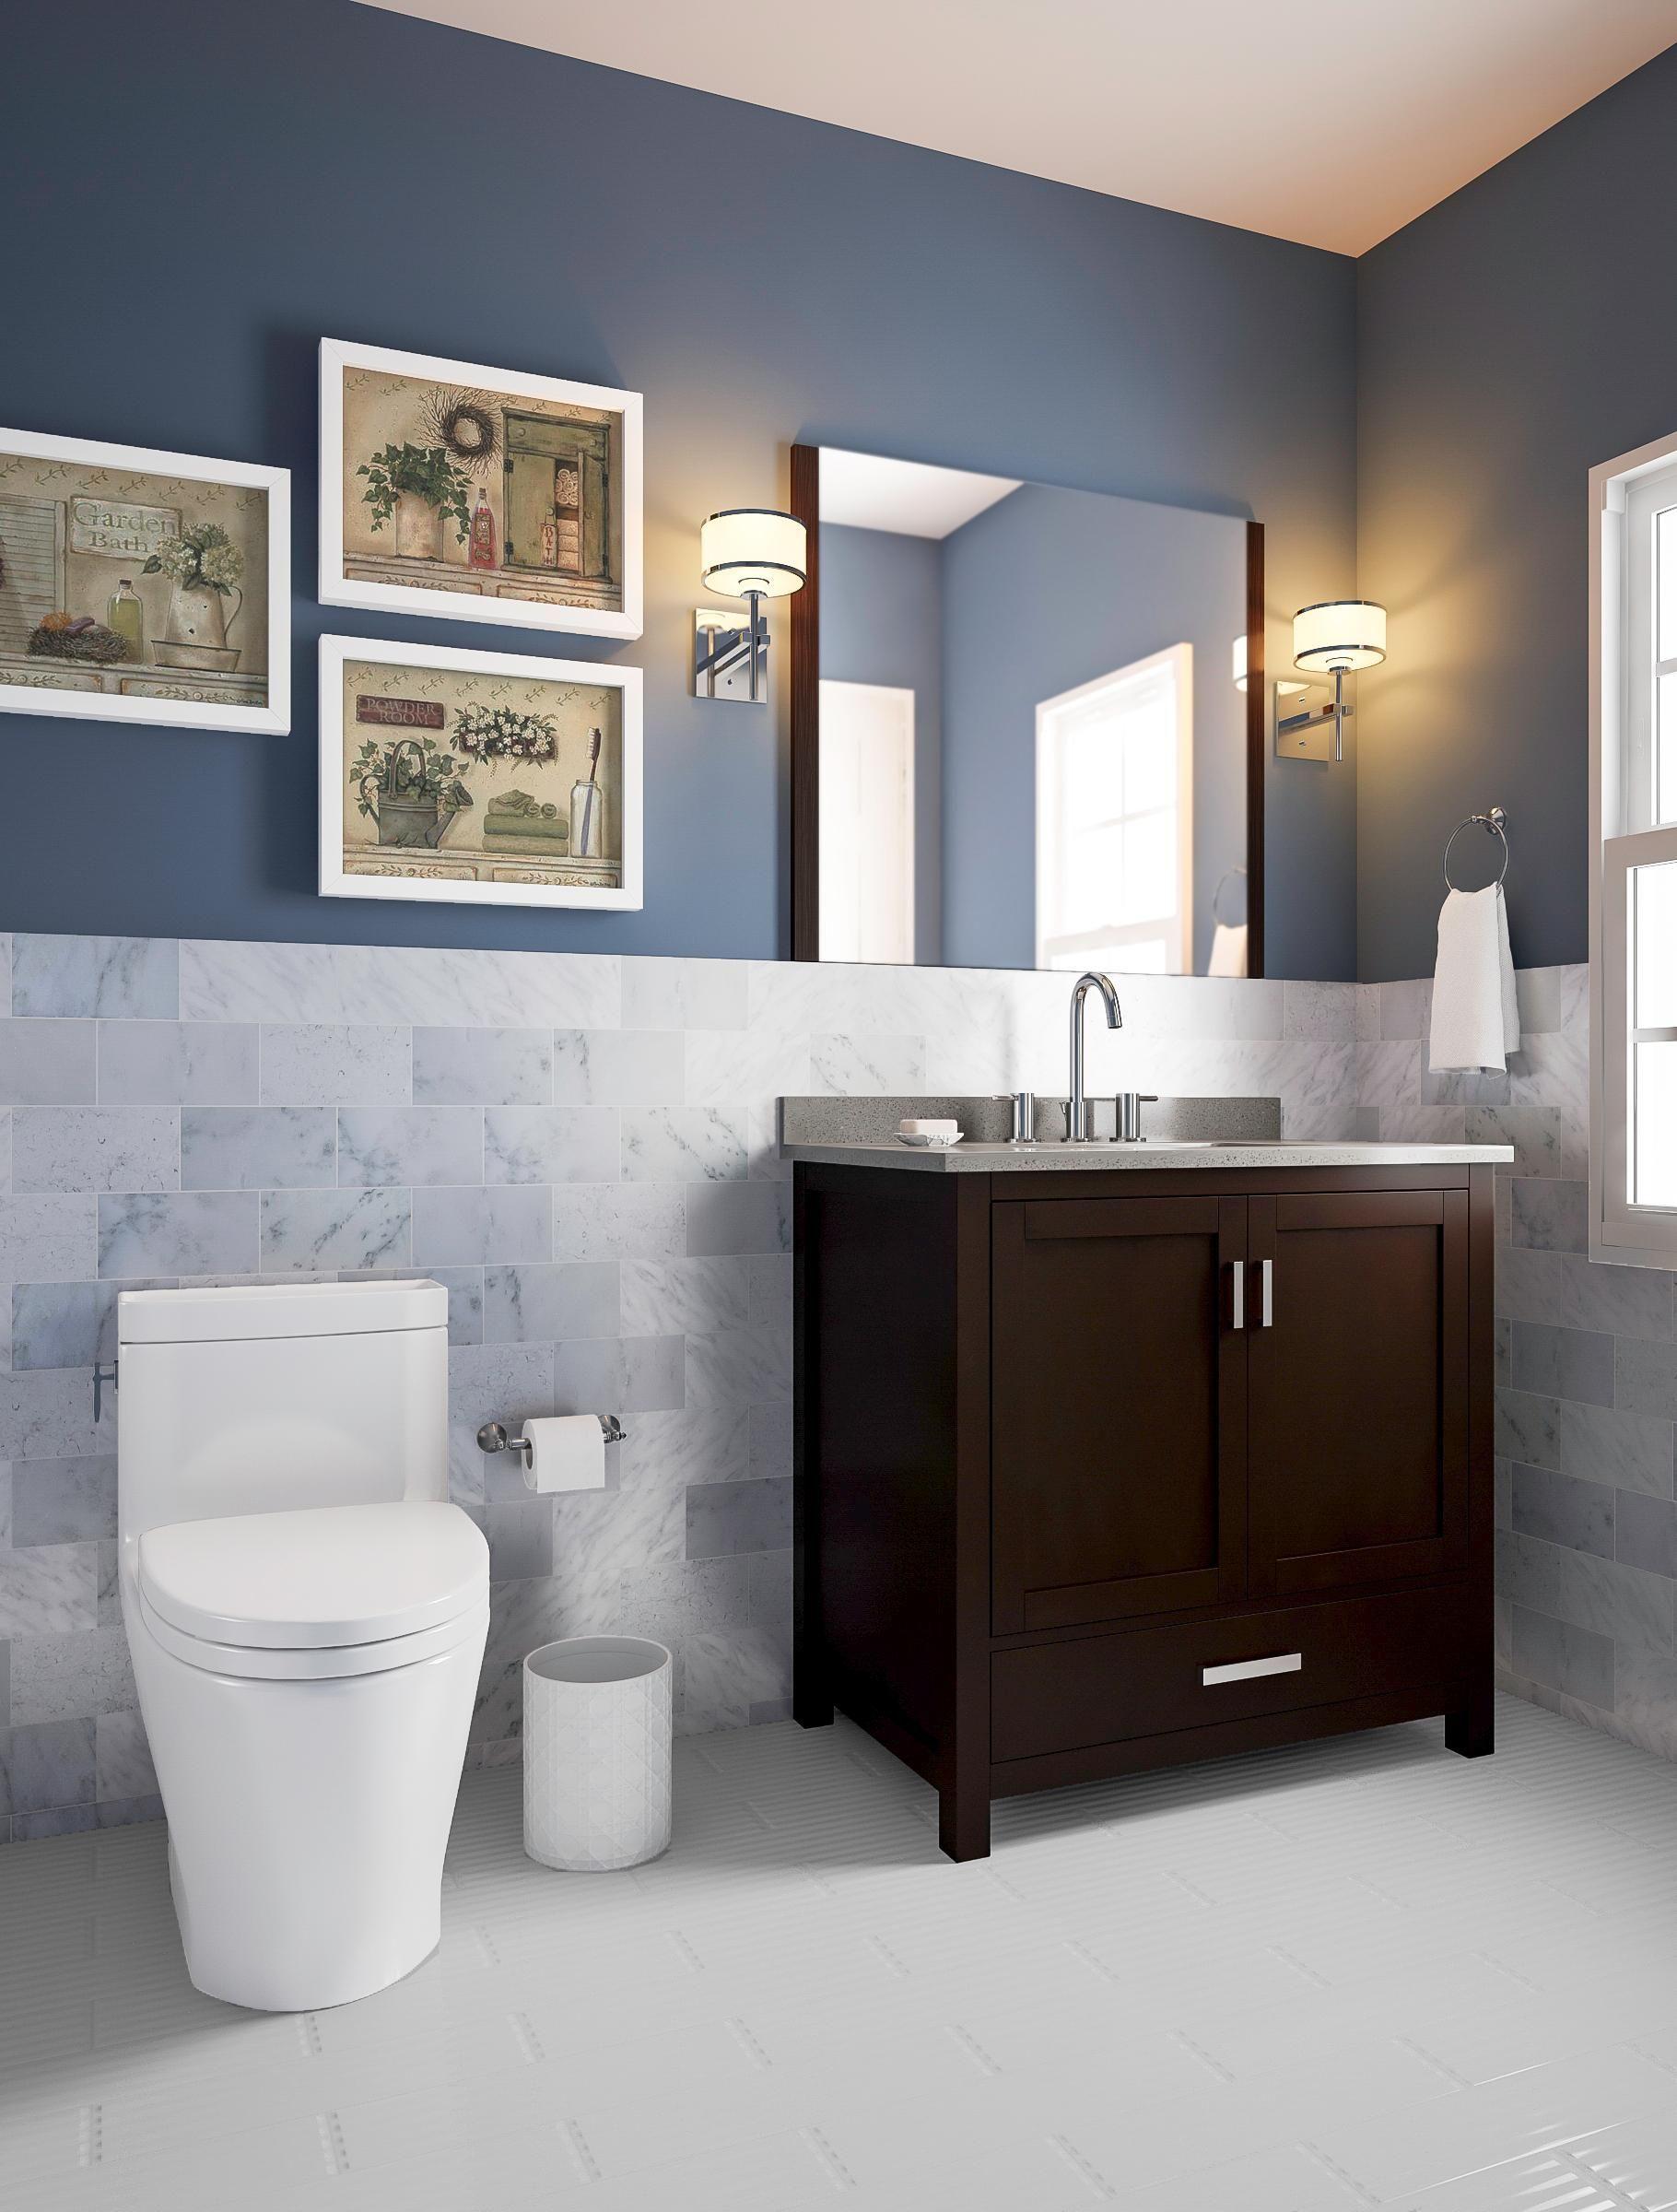 Bathroom Remodel Ideas 558 Blue Bathroom Walls Navy Blue Bathroom Walls Bathrooms Remodel